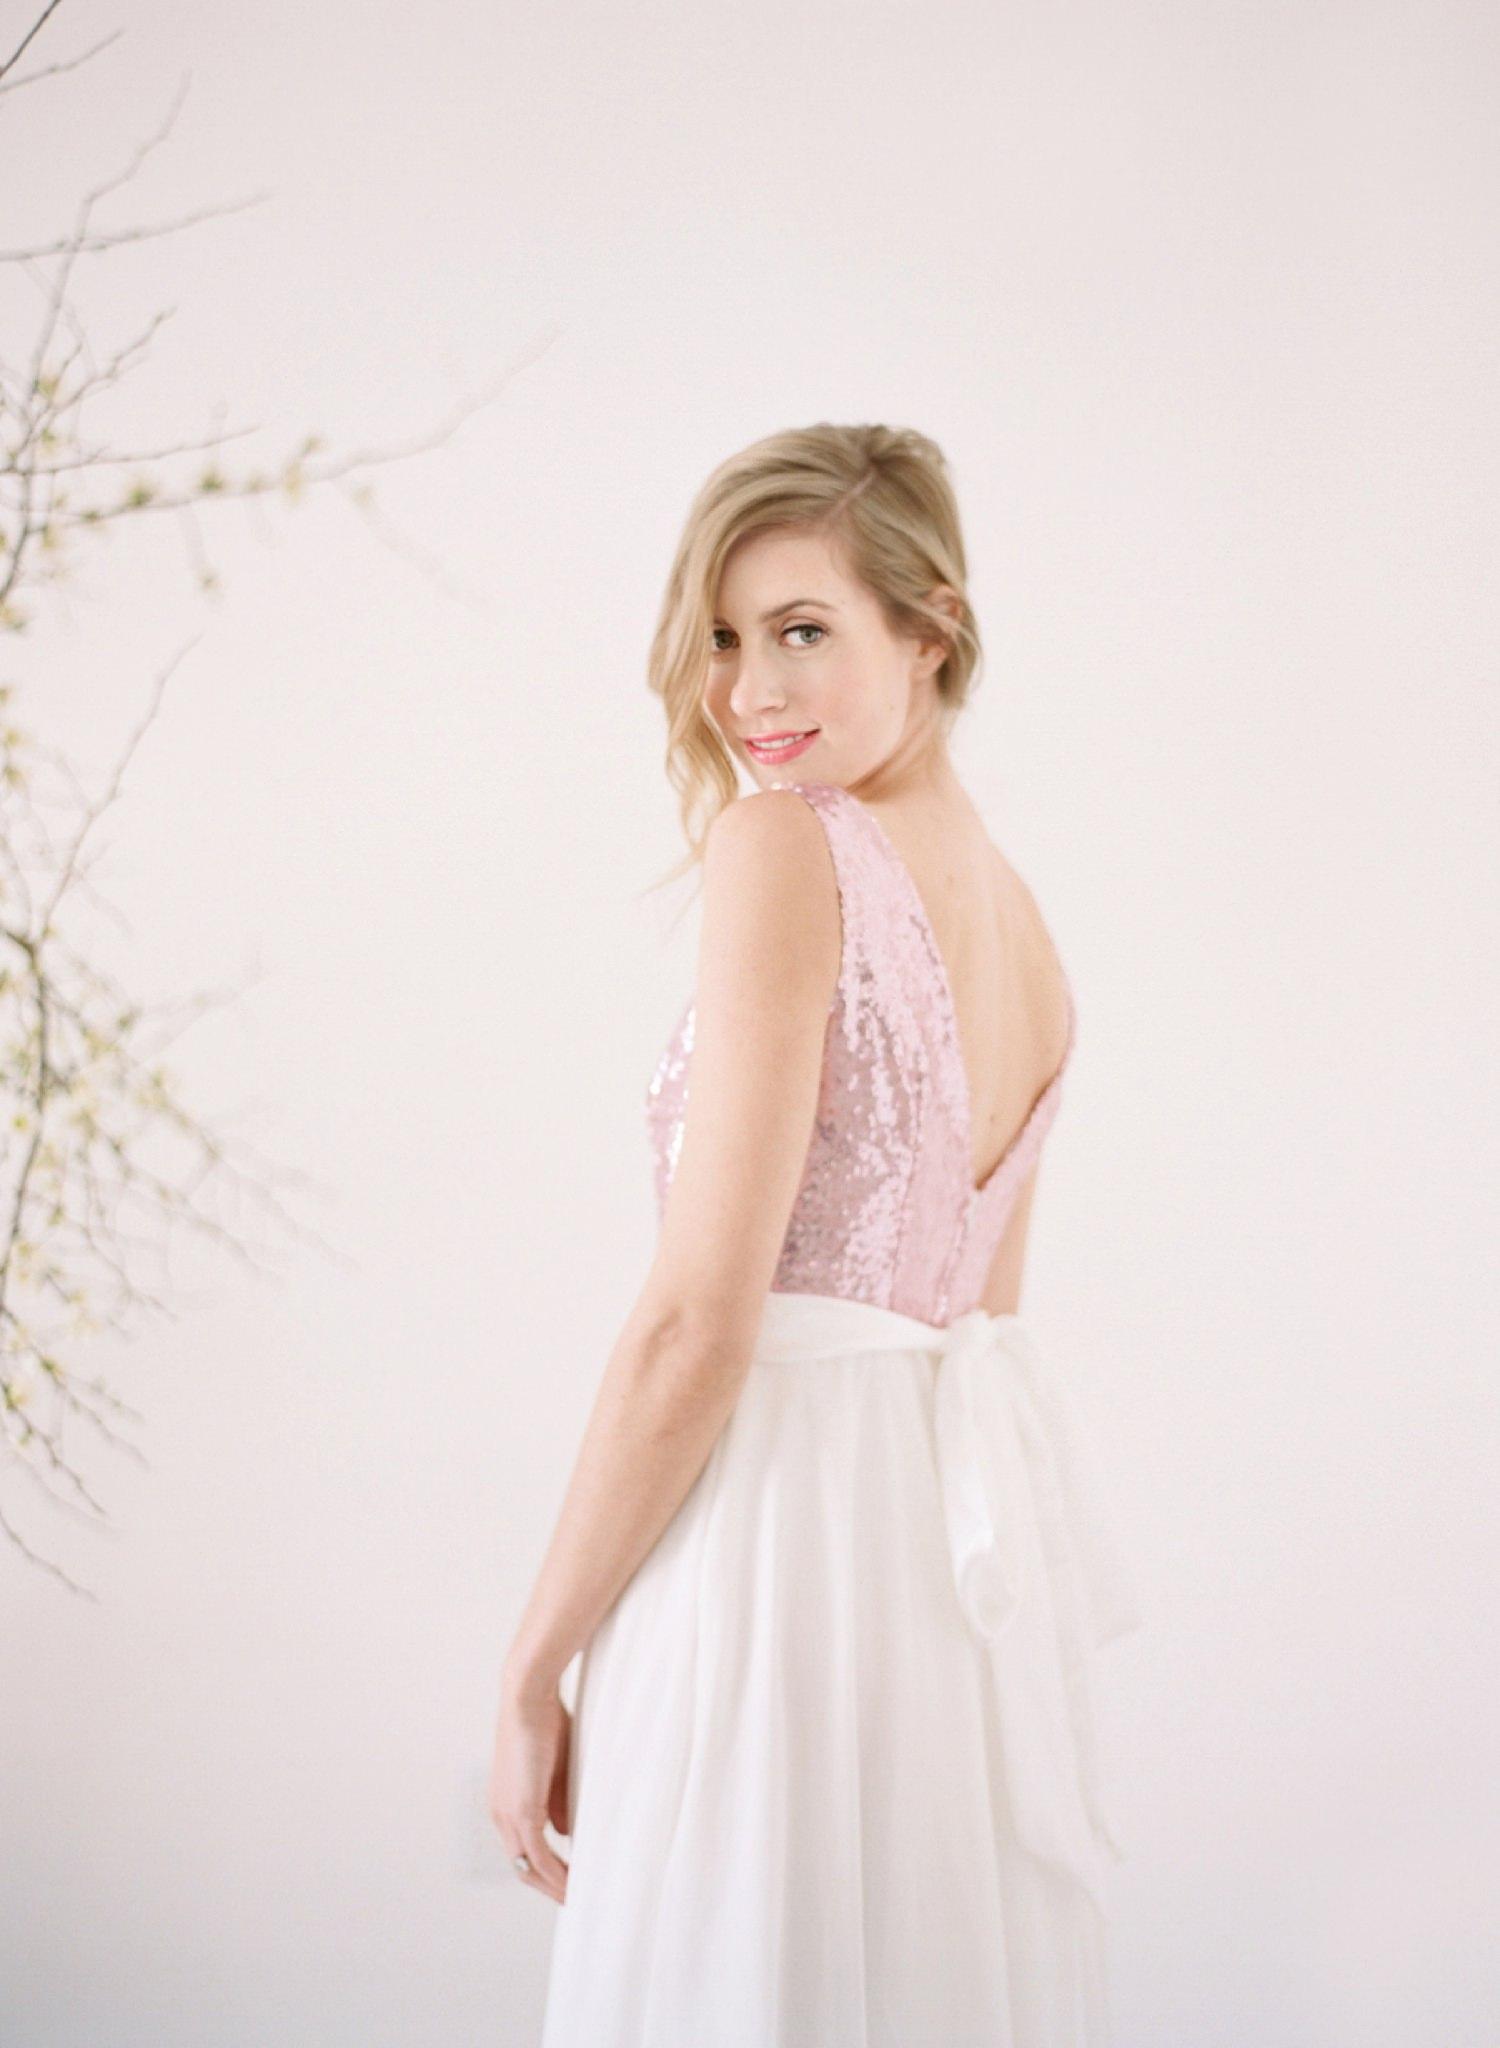 french bridal inspiration fashion shoot